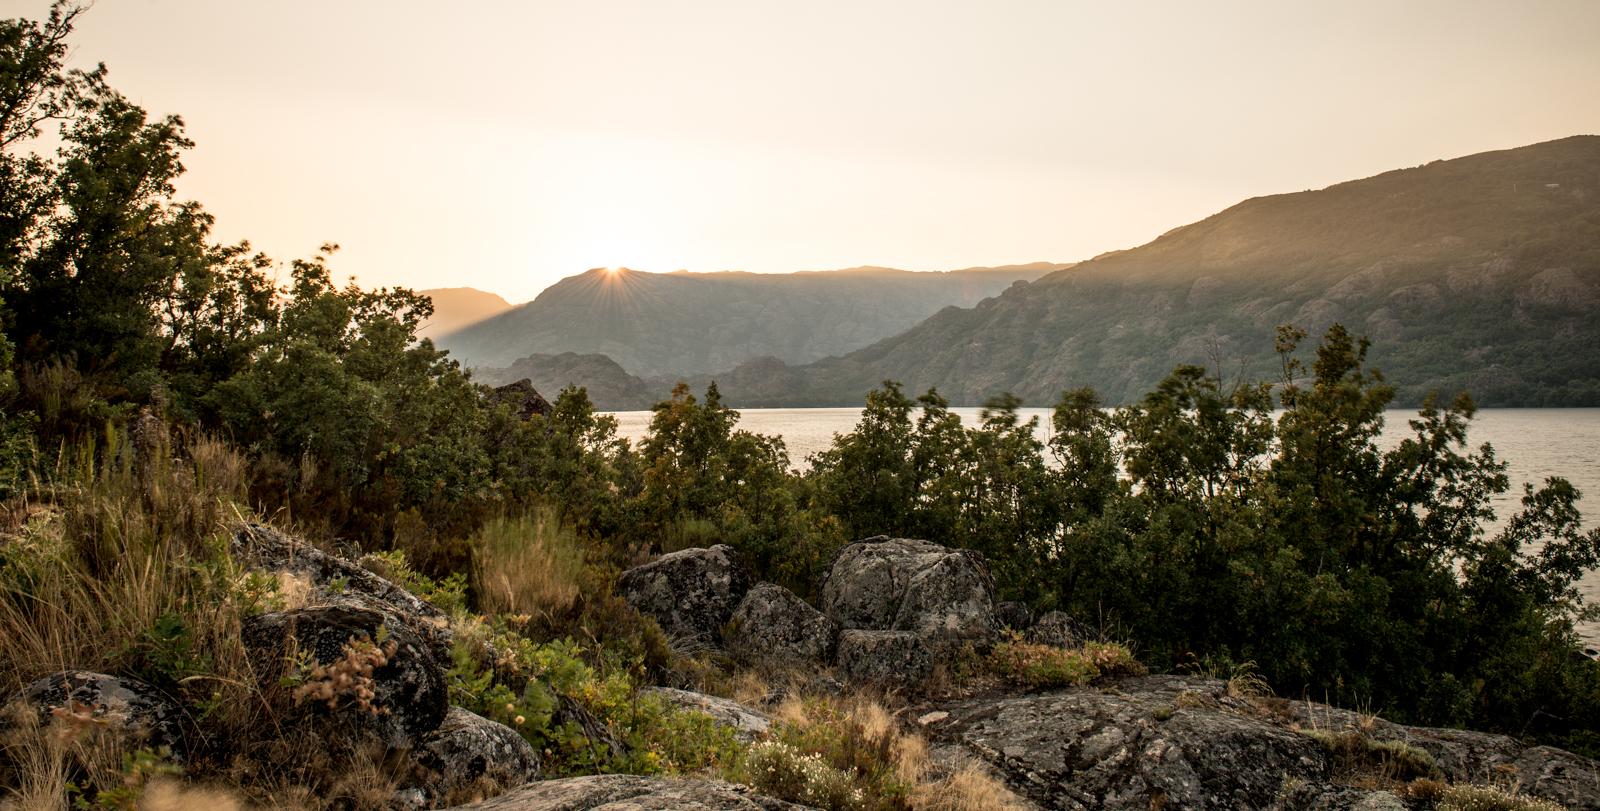 Lago_de_Sanabria-24.jpg